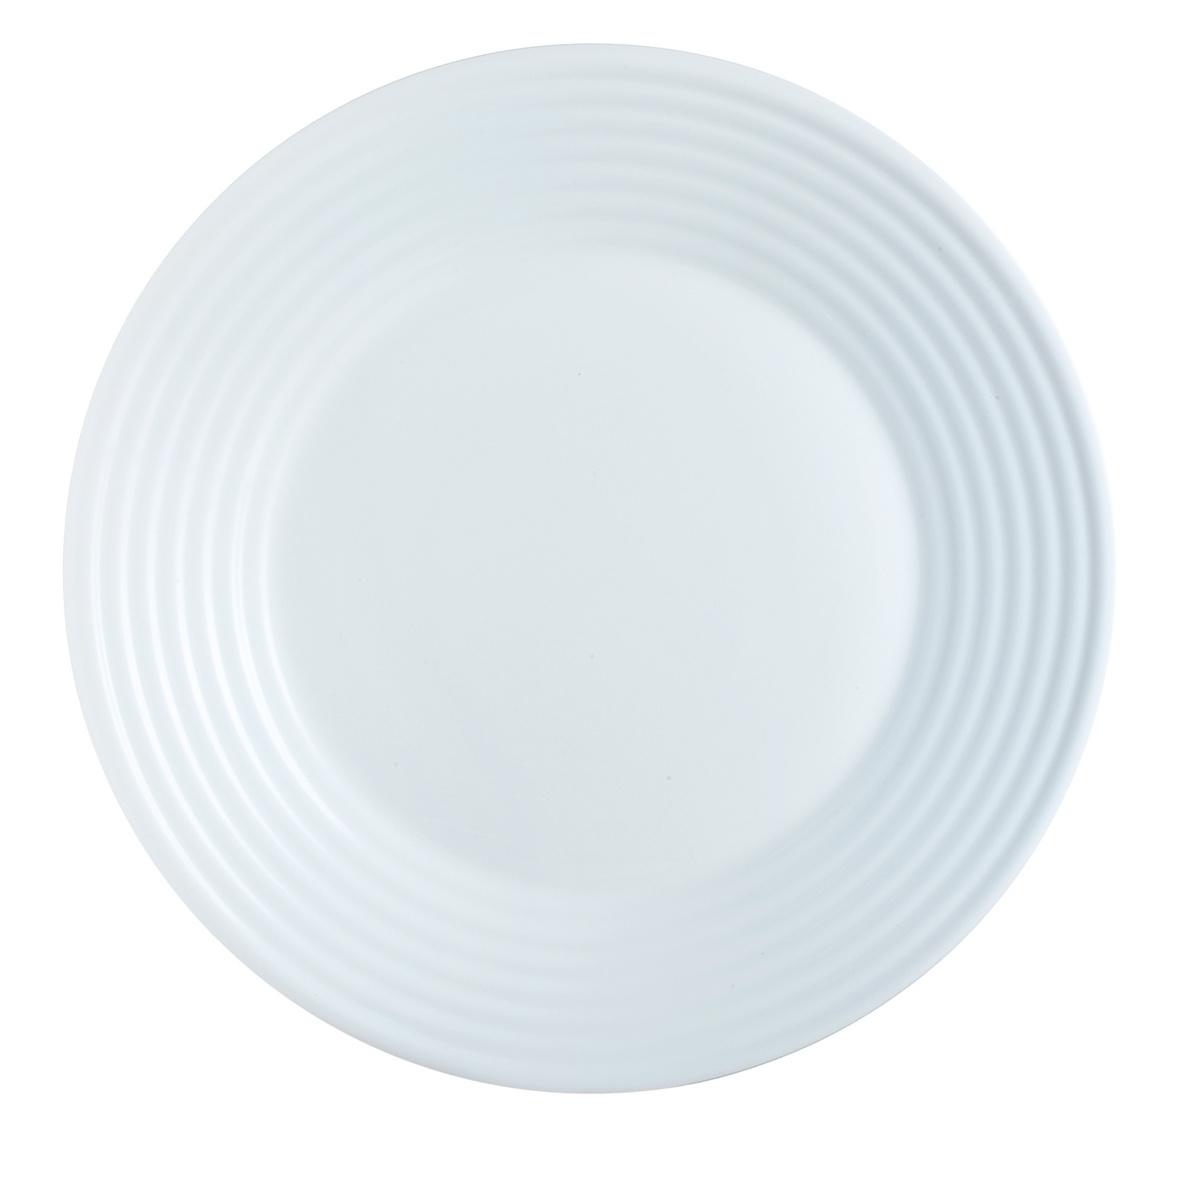 Assiette plate rond blanc Stairo Arcoroc